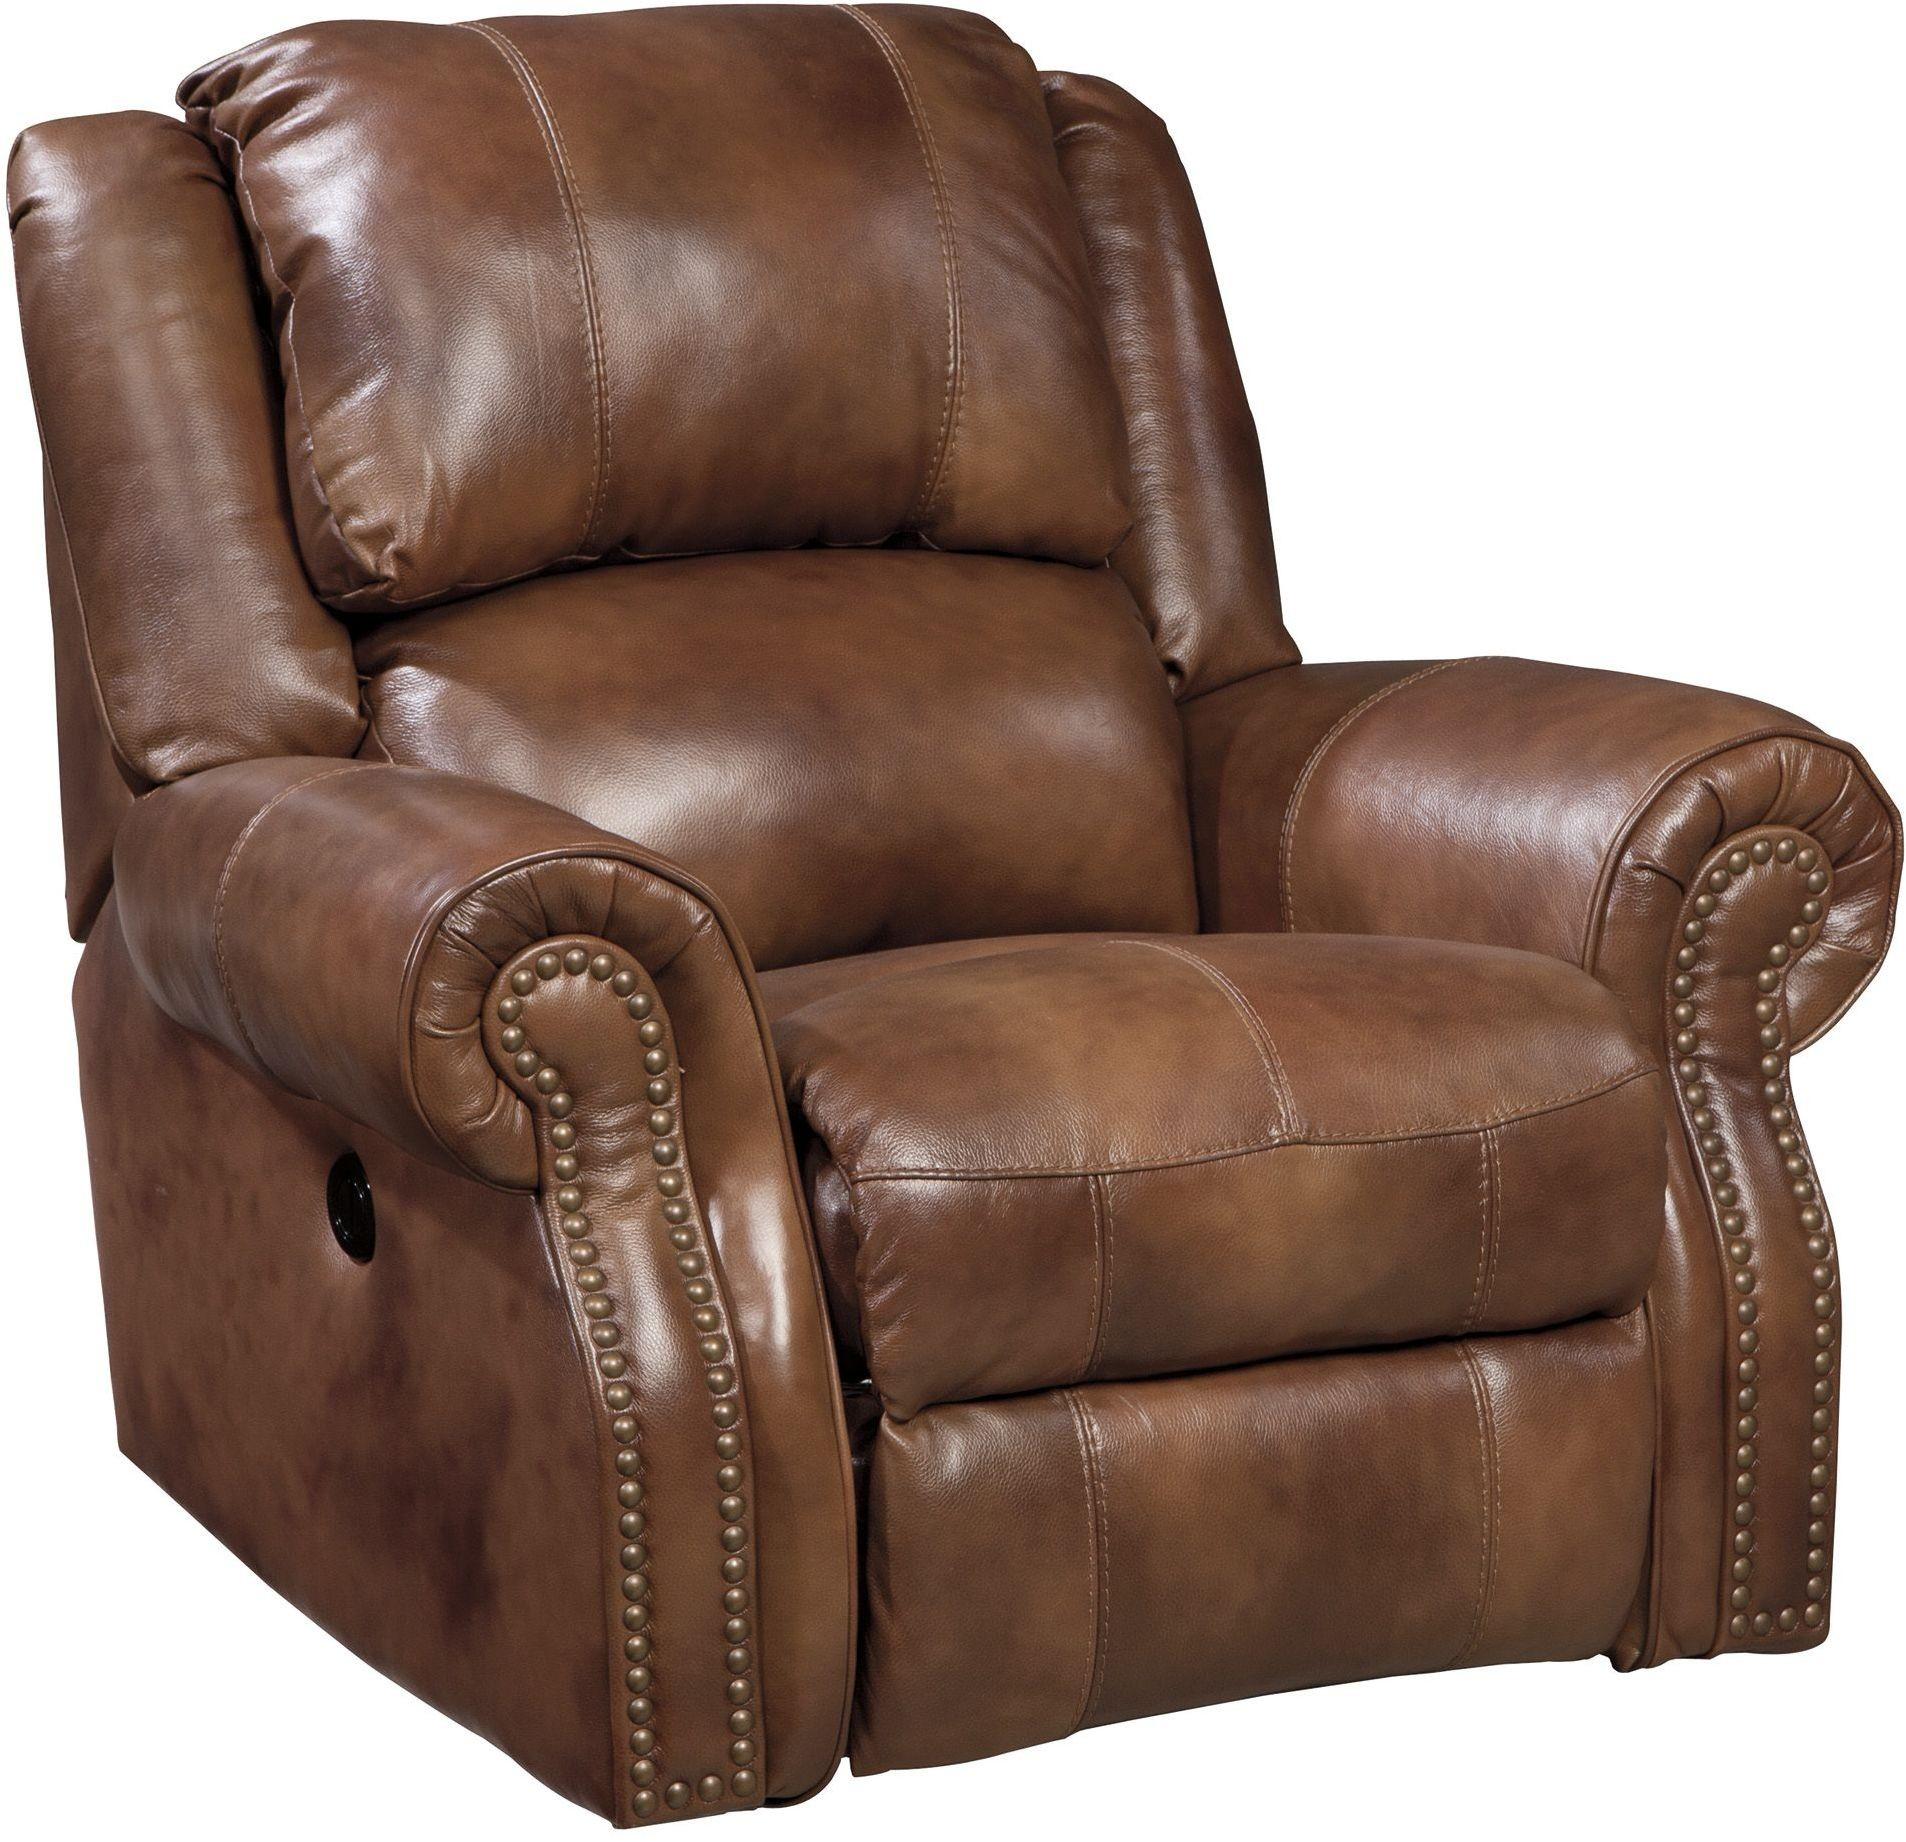 living colors com padded dorel rocker recliner ip massage multiple walmart